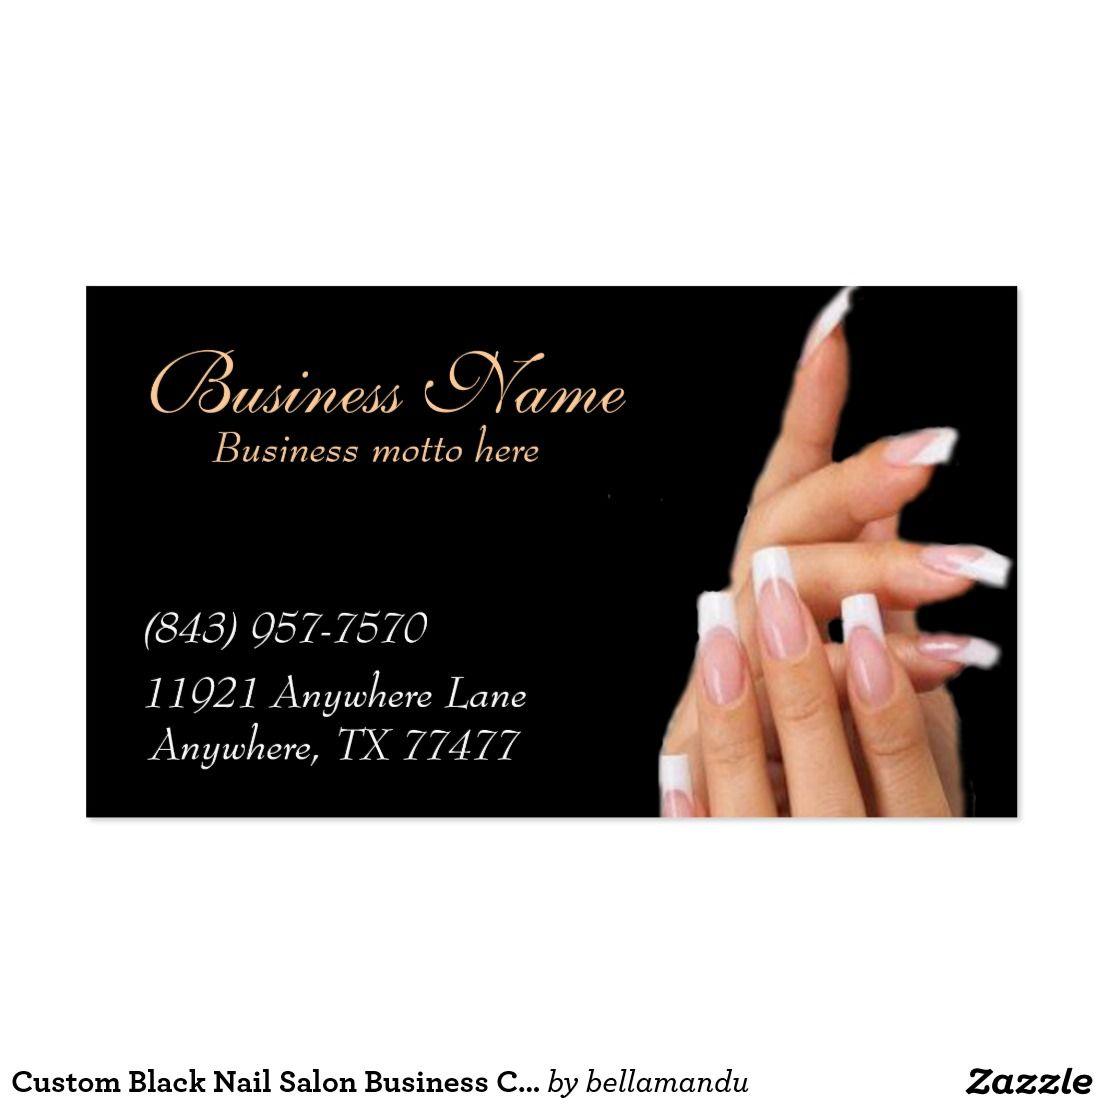 Custom Black Nail Salon Business Cards Zazzle.co.uk